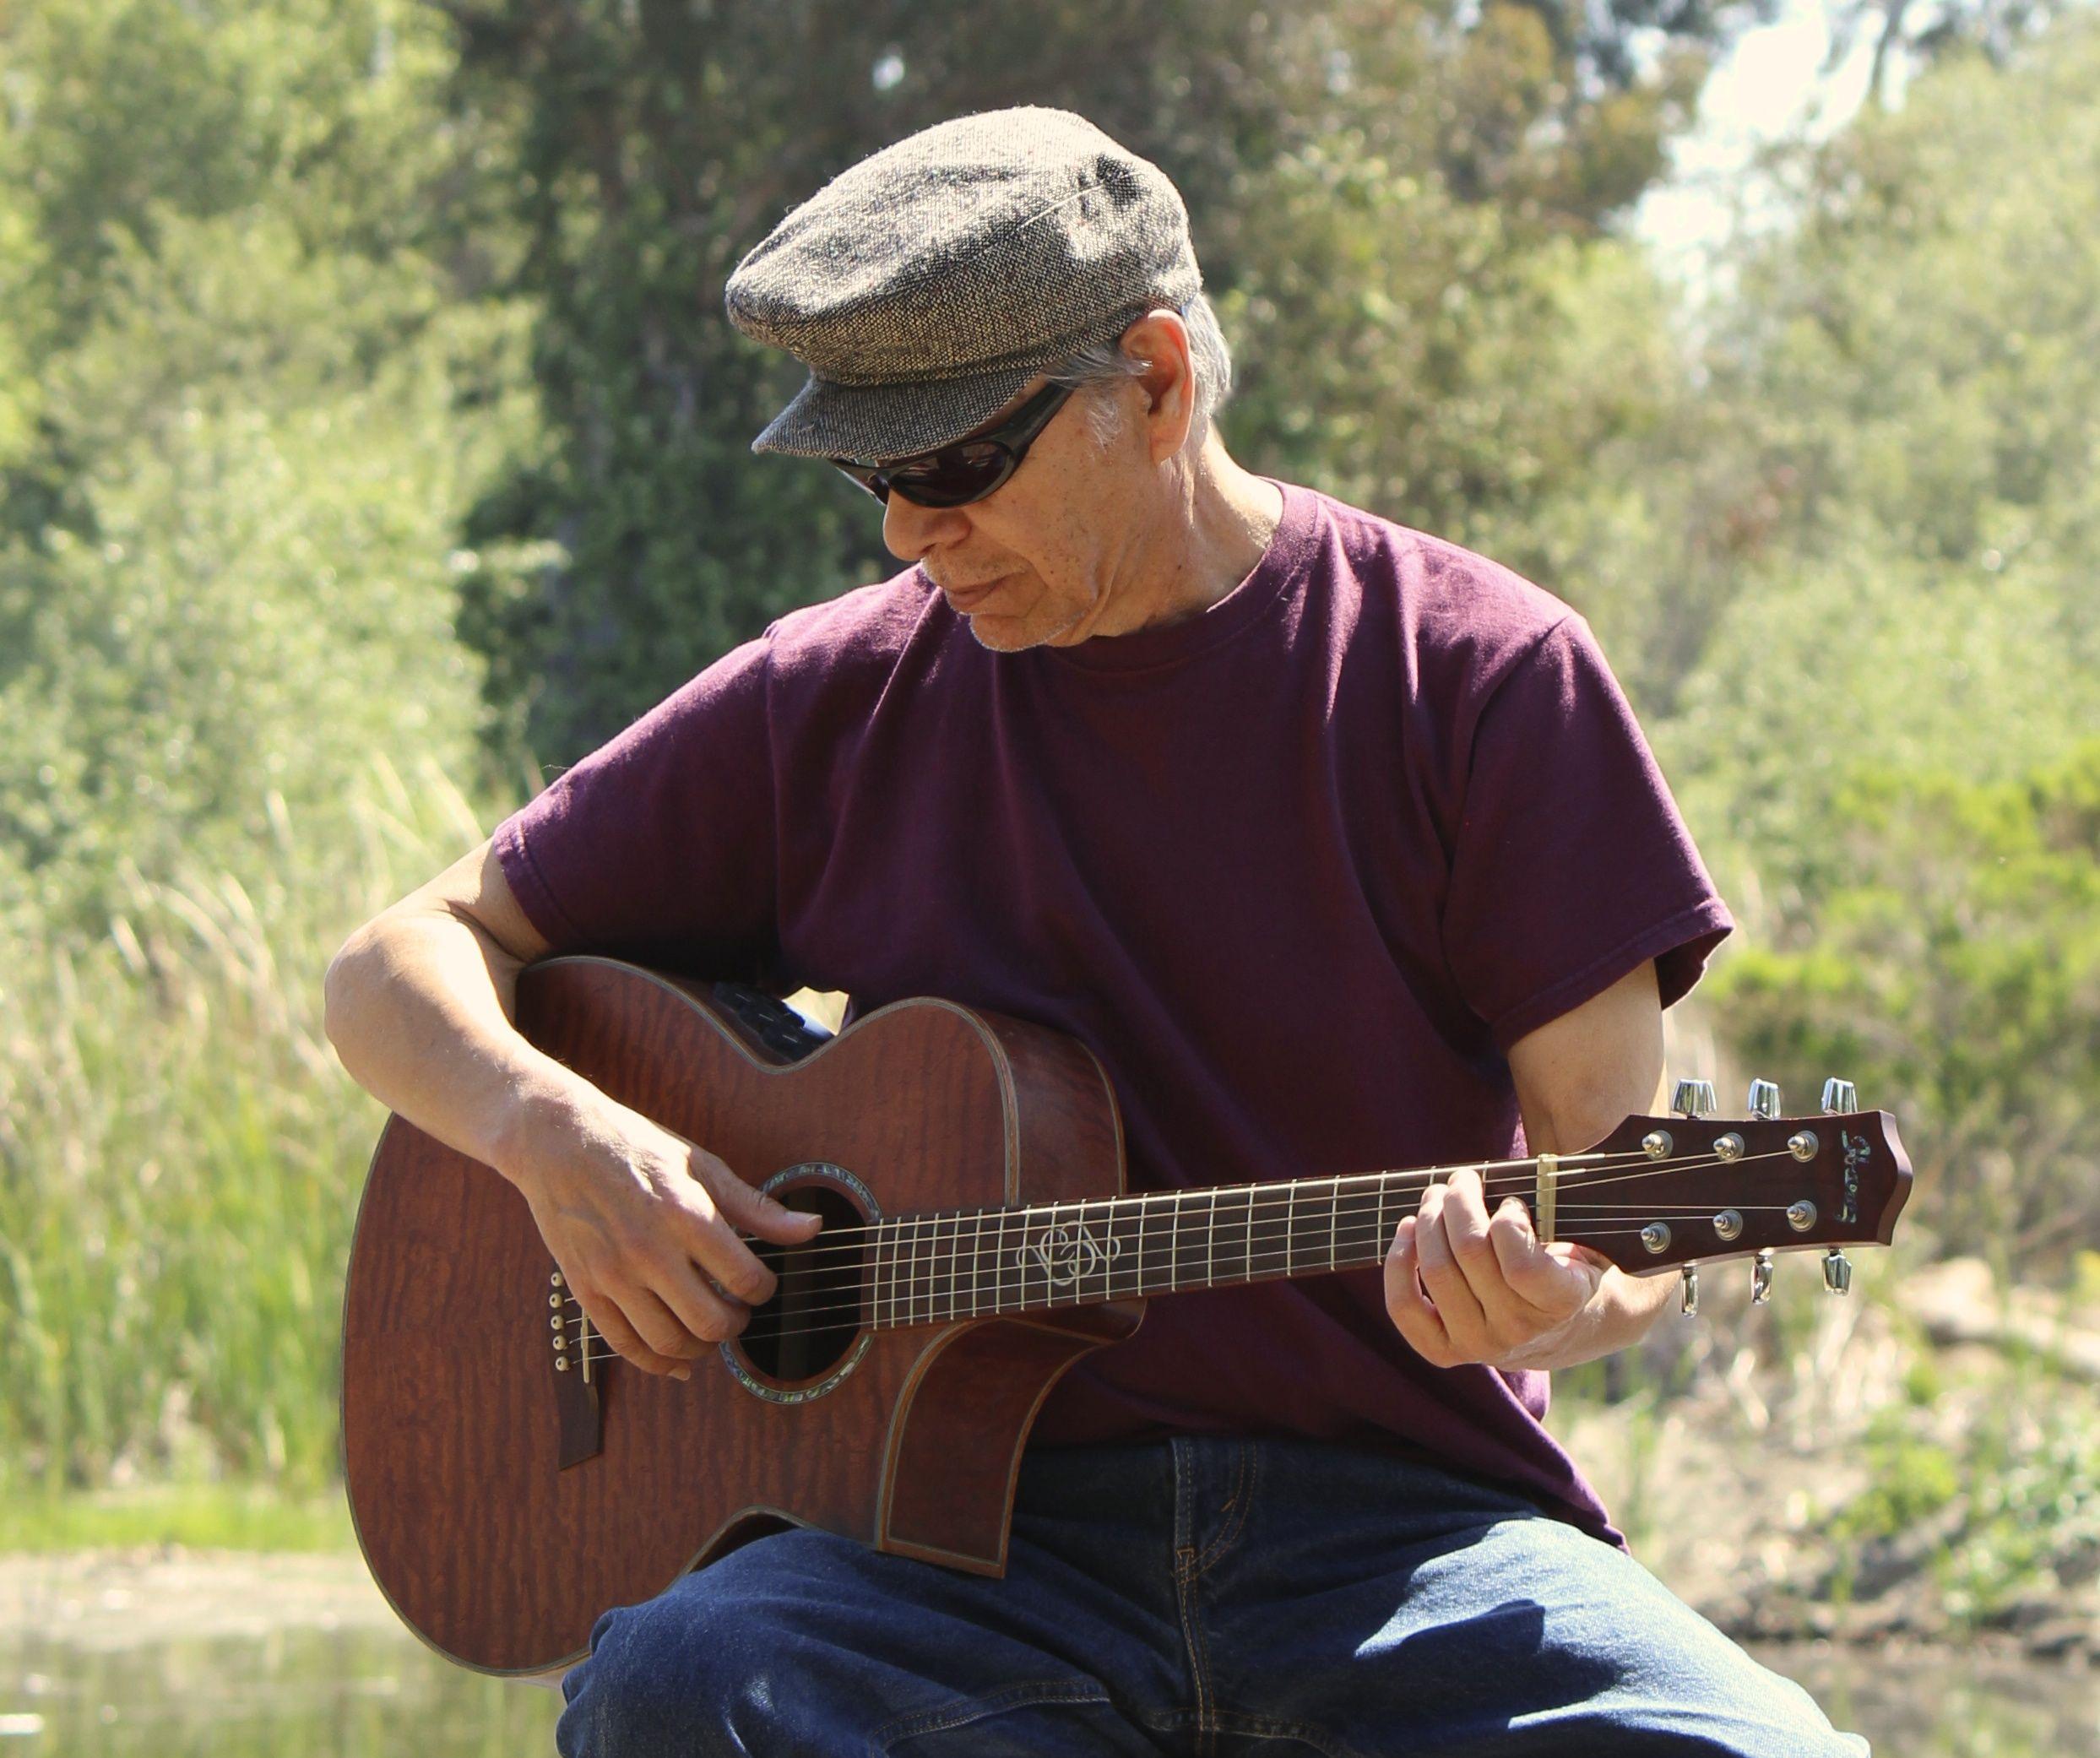 Don Luna acoustic guitar performances north San Diego